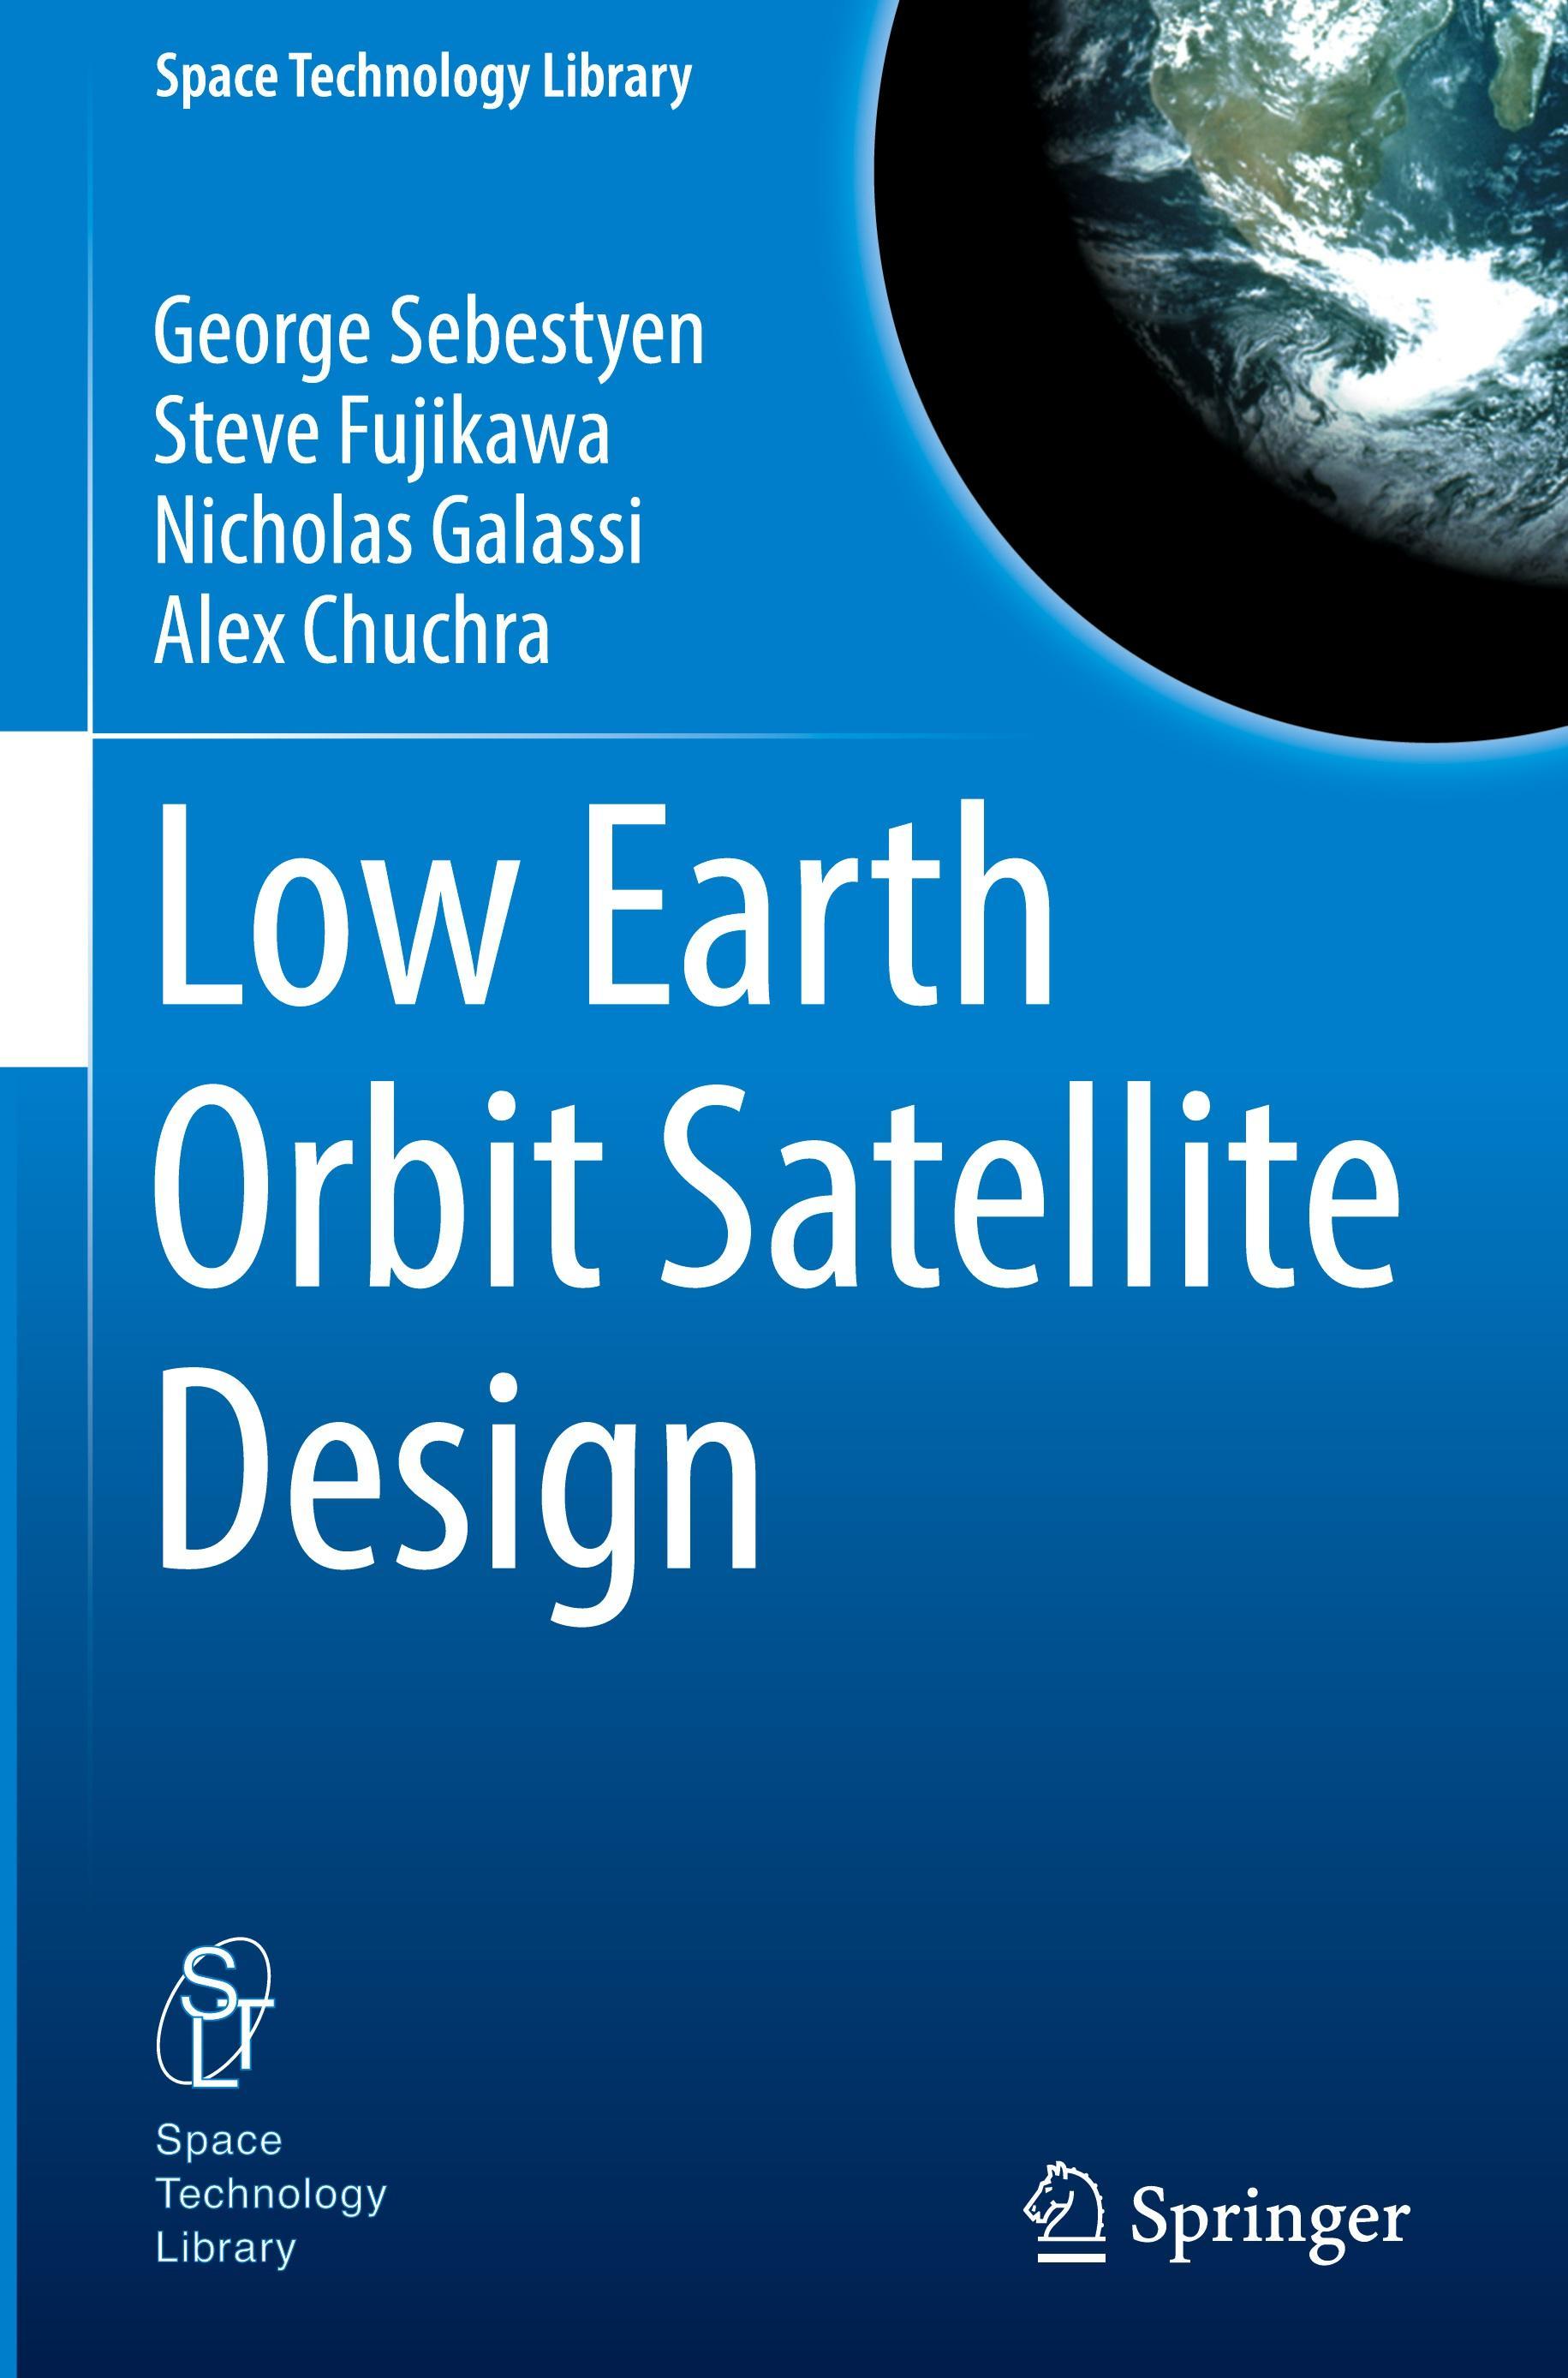 Low Earth Orbit Satellite Design - George Sebestyen|Steve Fujikawa|Nicholas Galassi|Alex Chuchra